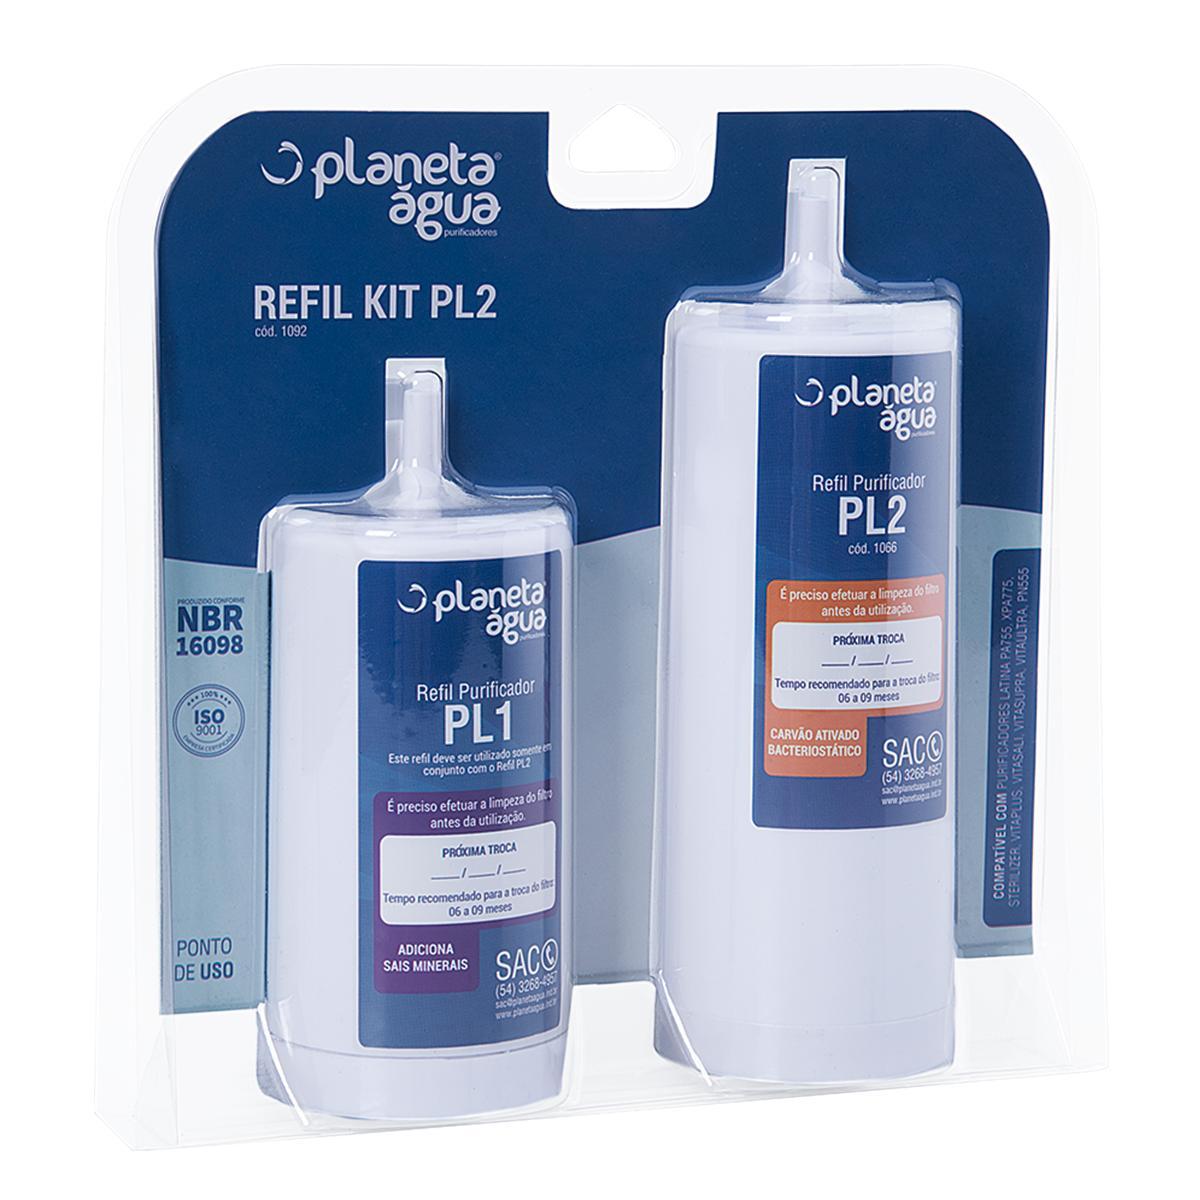 Refil  KIT PL2 para purificadores Latina Mineralizer, PA735, PA755, XPA775, Sterelizer, PN555, Vita Plus, Vita Sali, Vita Supra, Vita Ultra - Similar